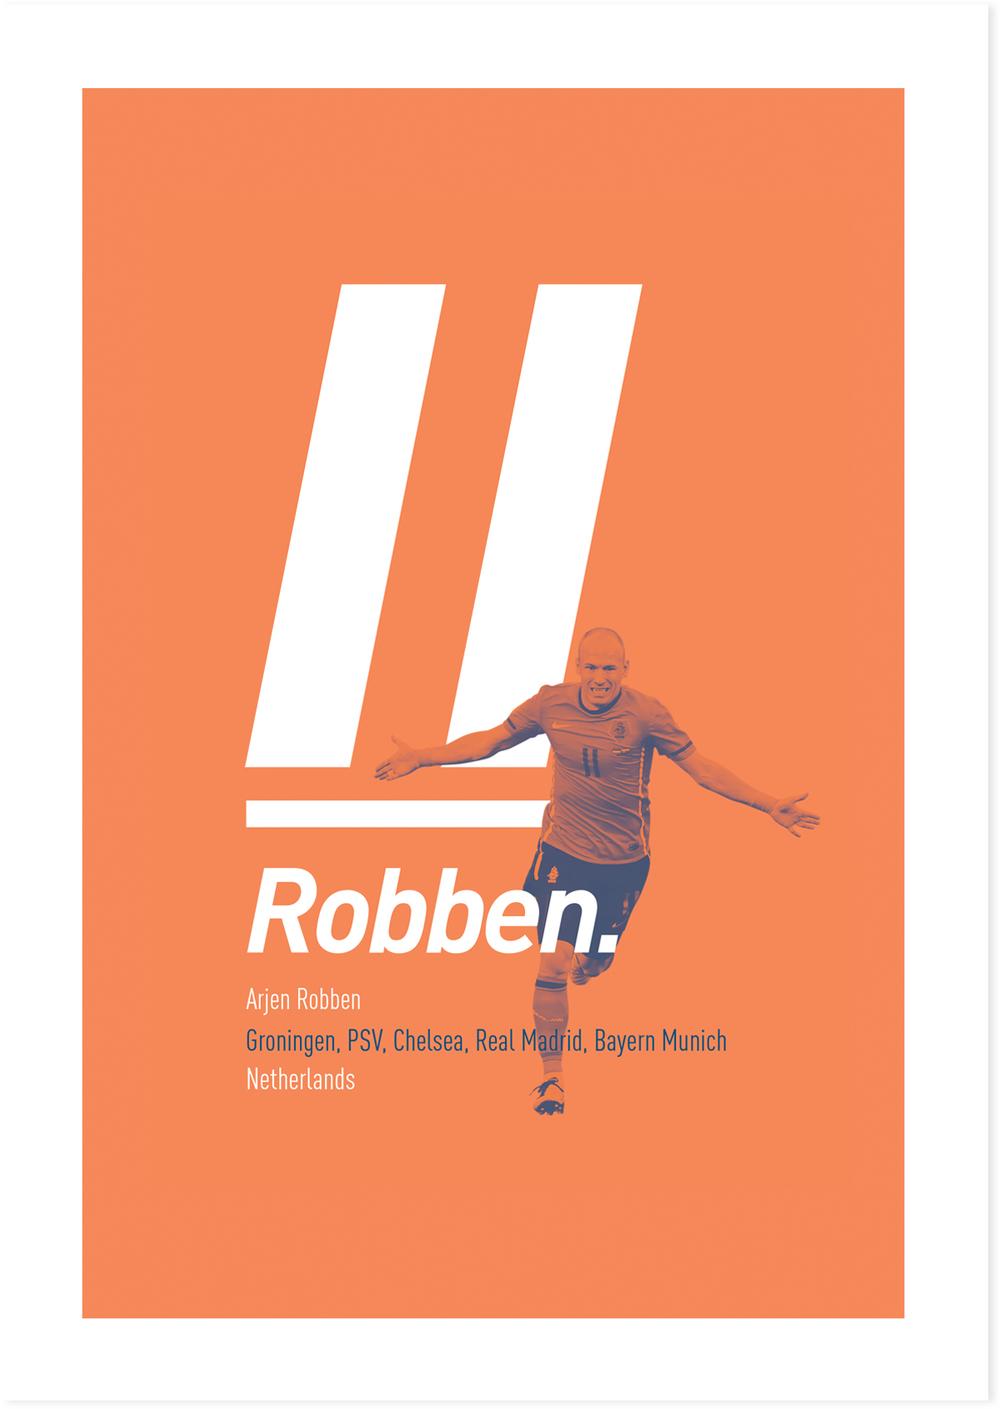 Robben_web.jpg